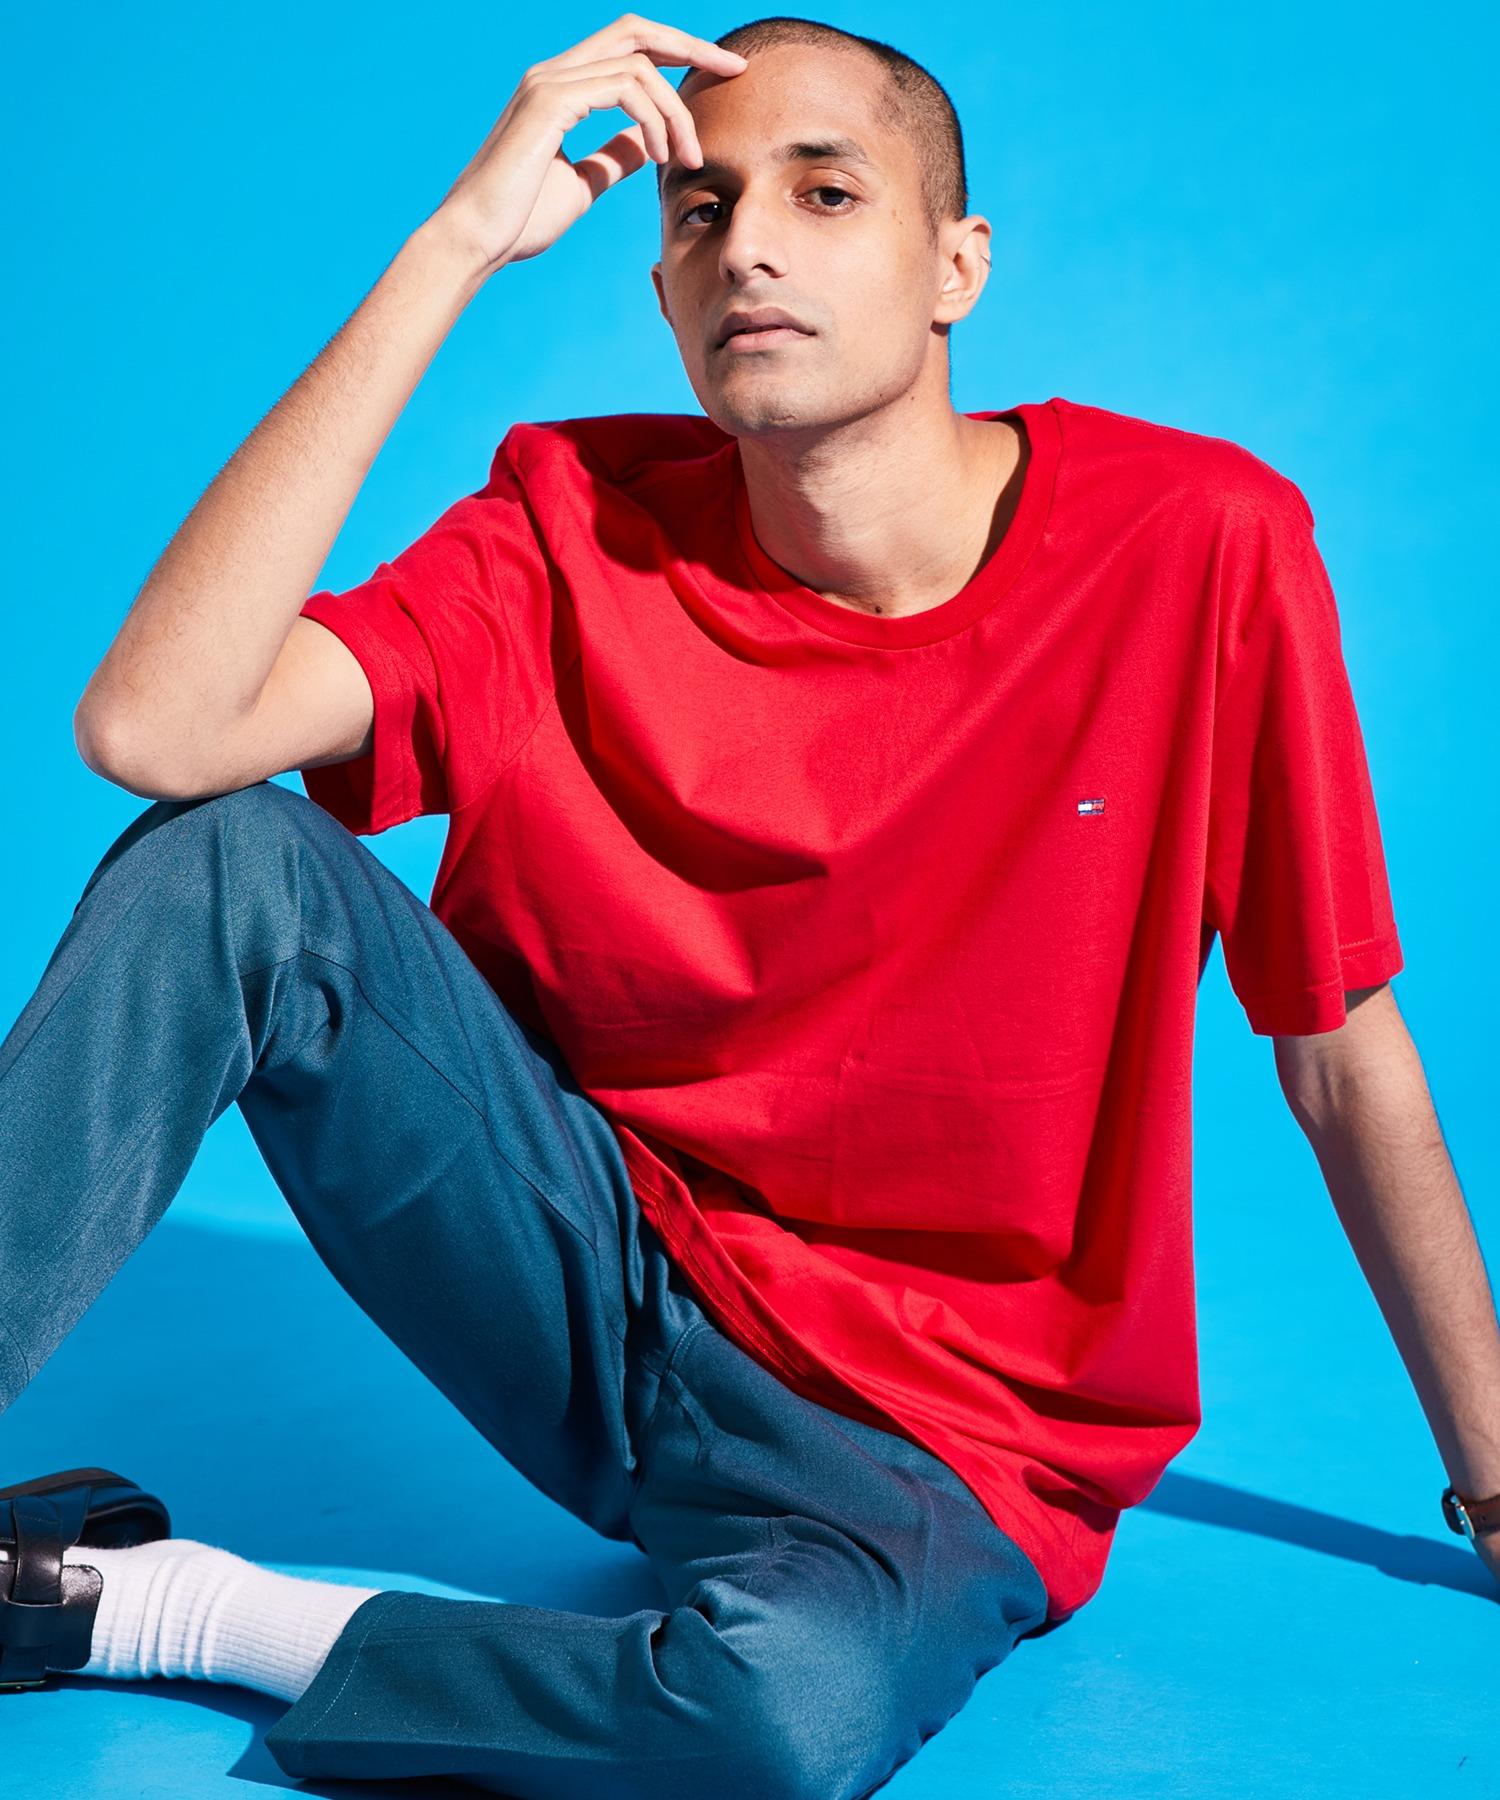 TOMMY HILFIGER/トミー ヒルフィガー CORE FLAG CREW NECK TEE クルーネック半袖Tシャツ